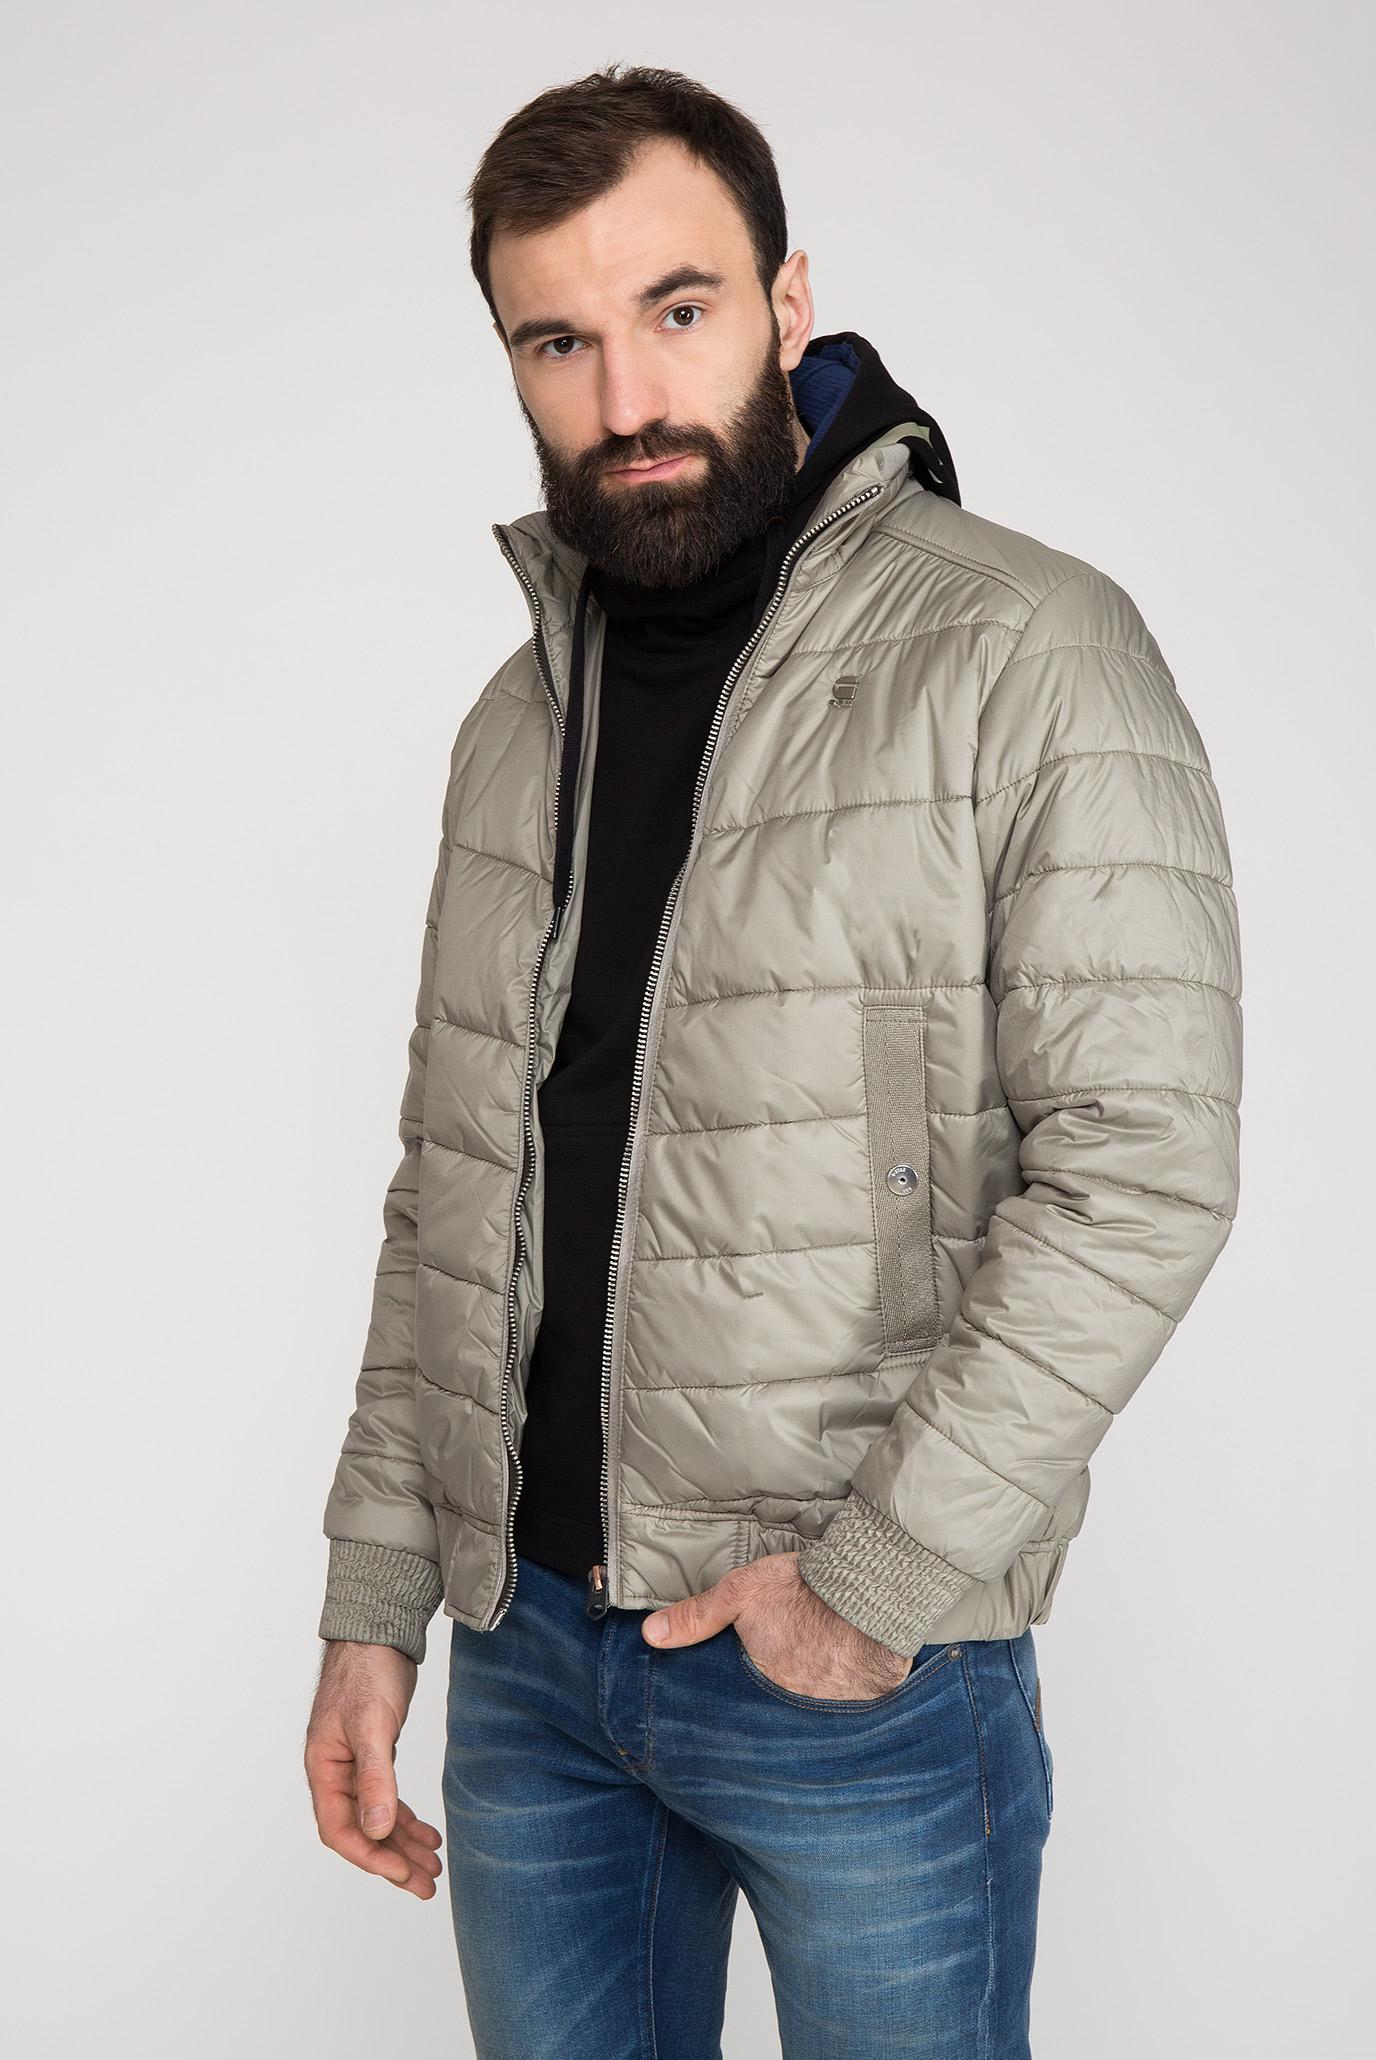 Мужская серая куртка Meefic G-Star RAW